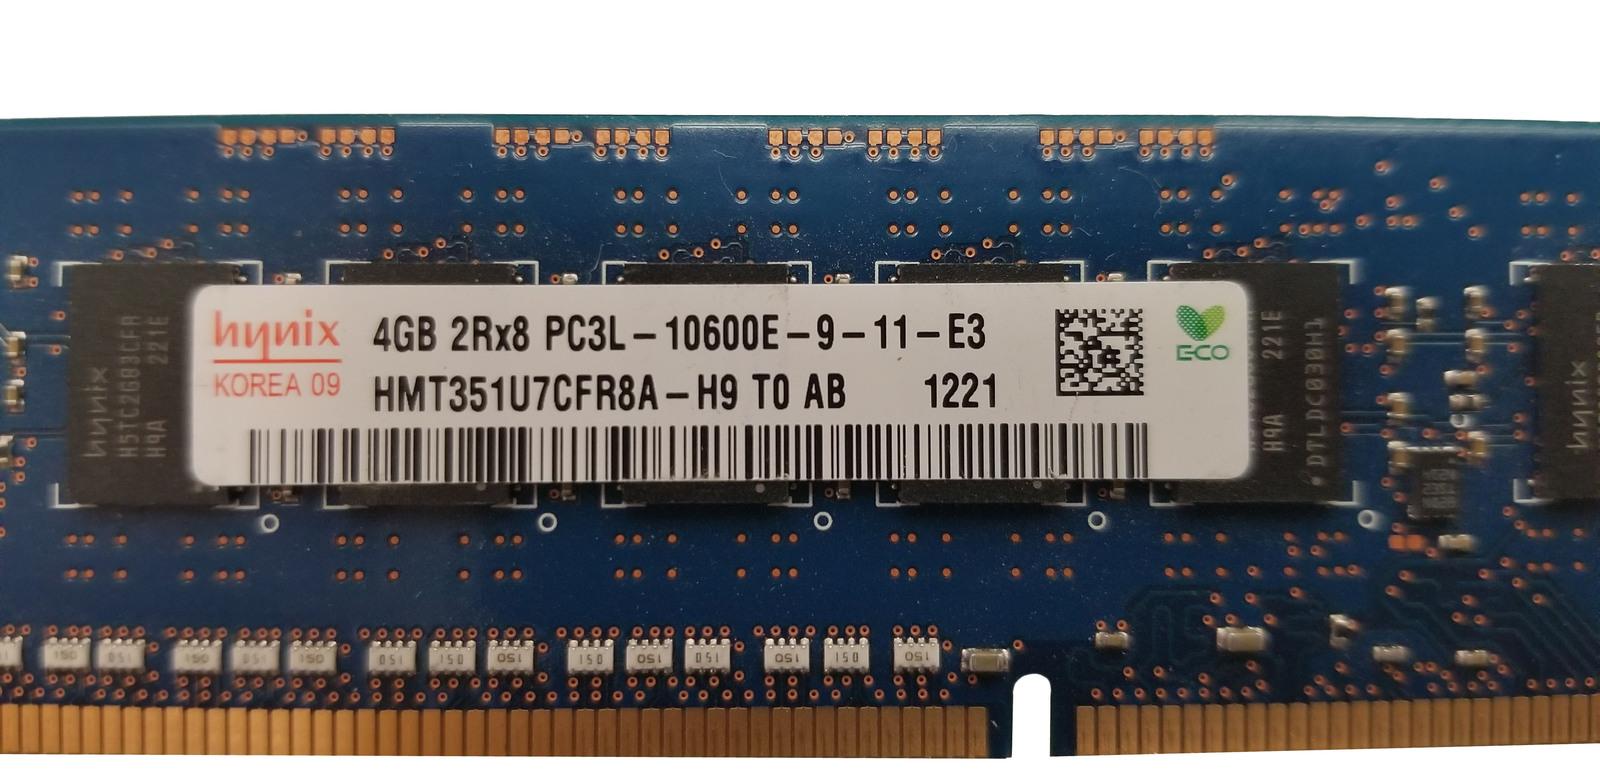 Hynix 4GB 2Rx8 PC3L-10600E-9-11-E3 SERVER RAM (HMT351U7CFR8A-H9) Bin:12